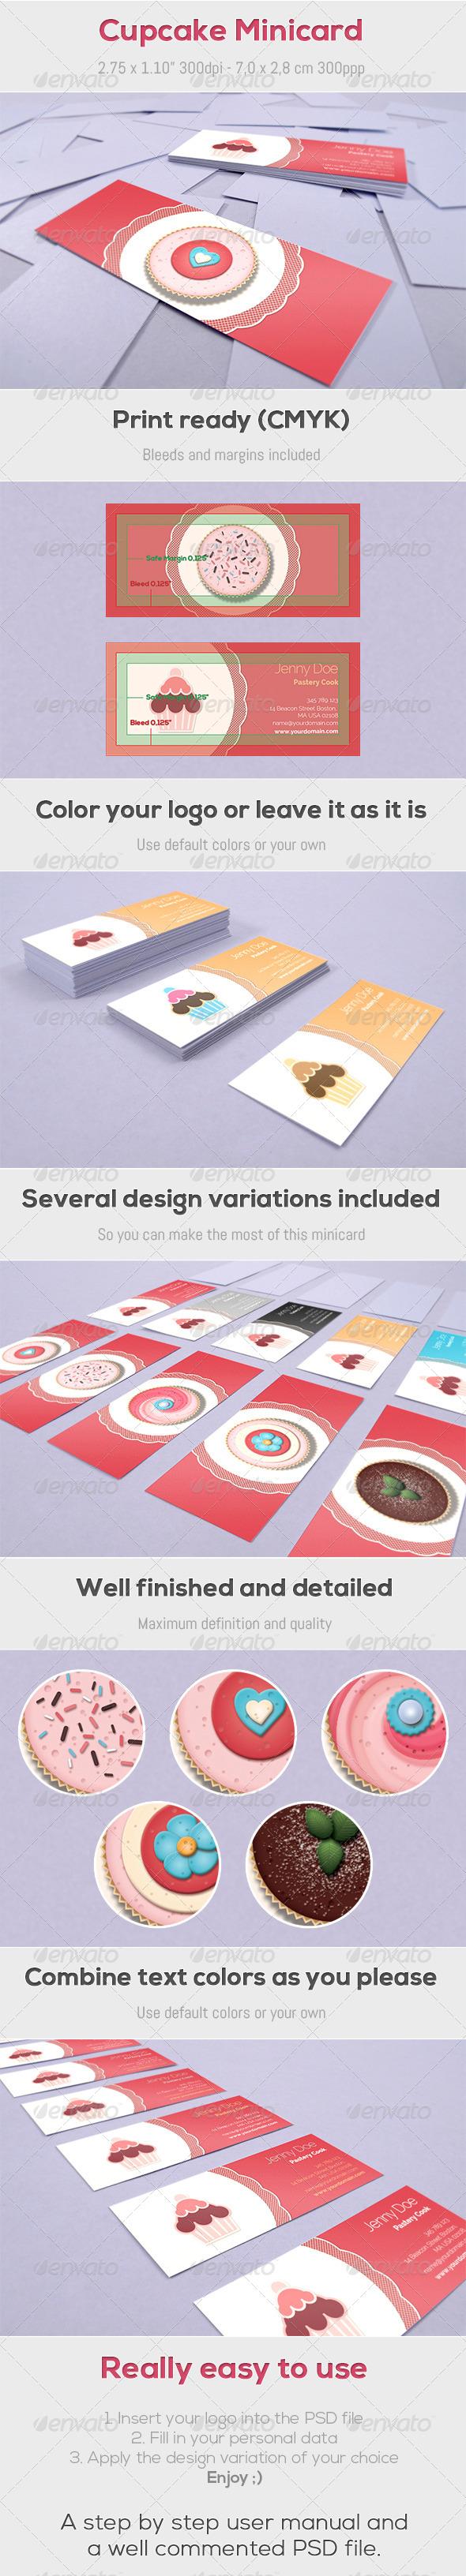 GraphicRiver Cupcake Minicard 4155691